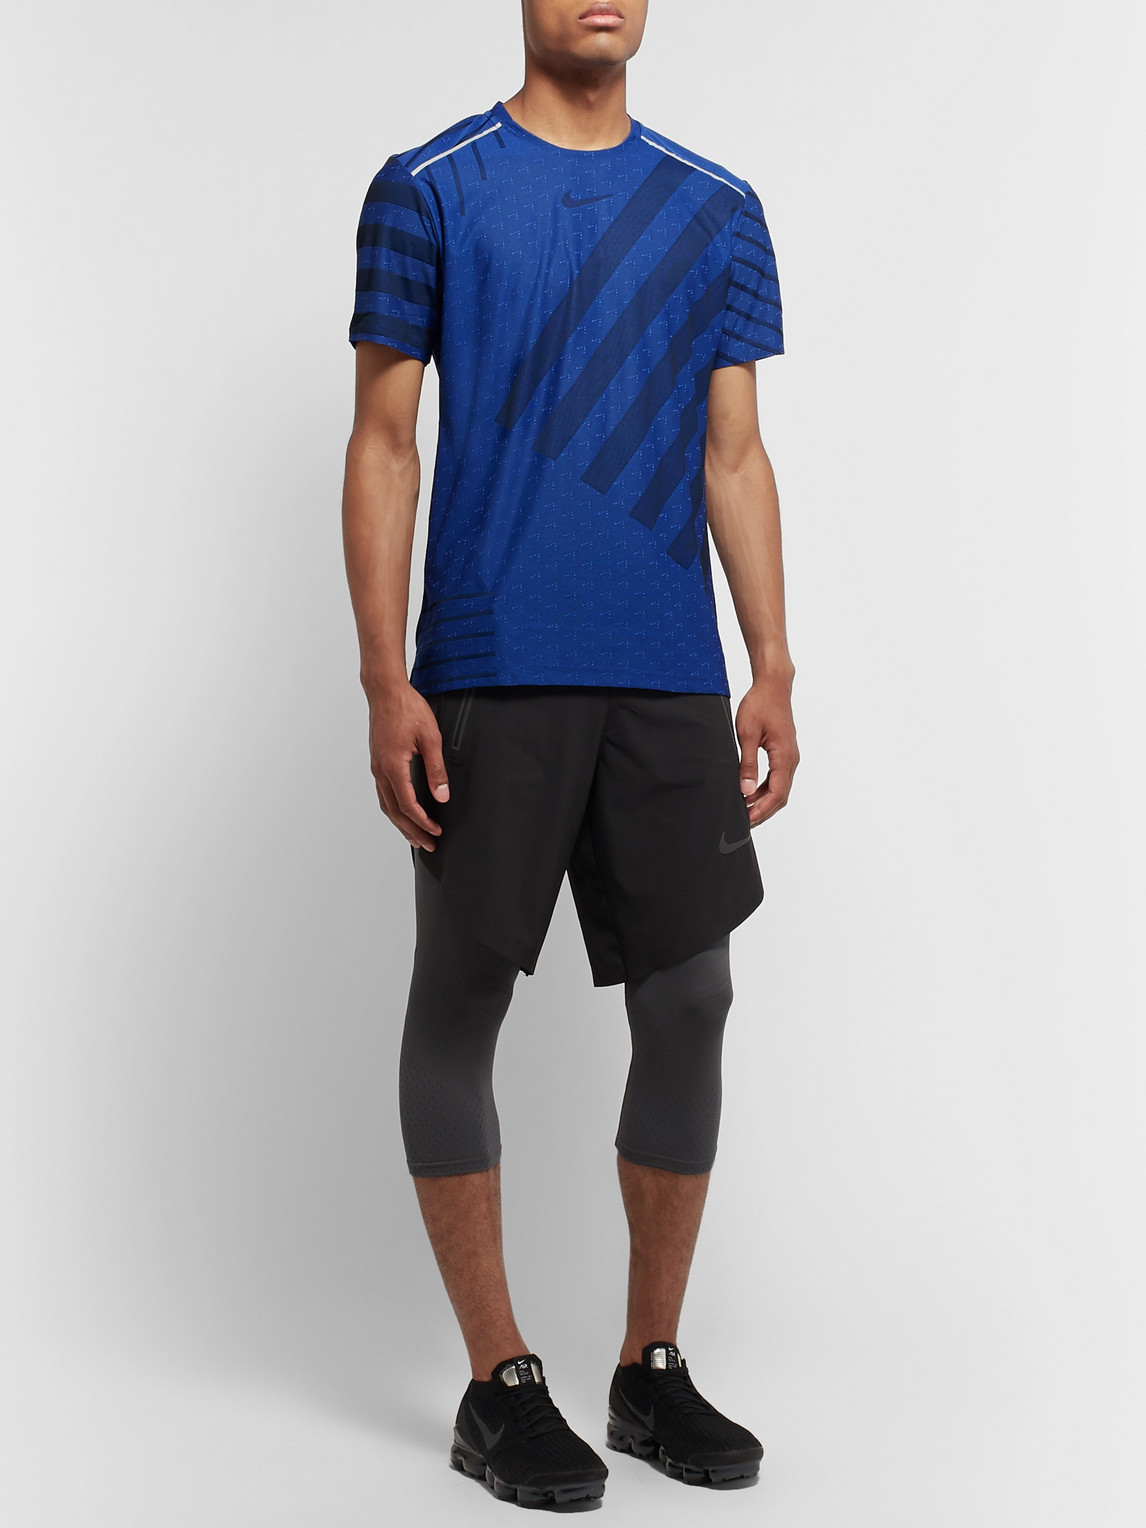 Nike Shorts ULTRA SLIM